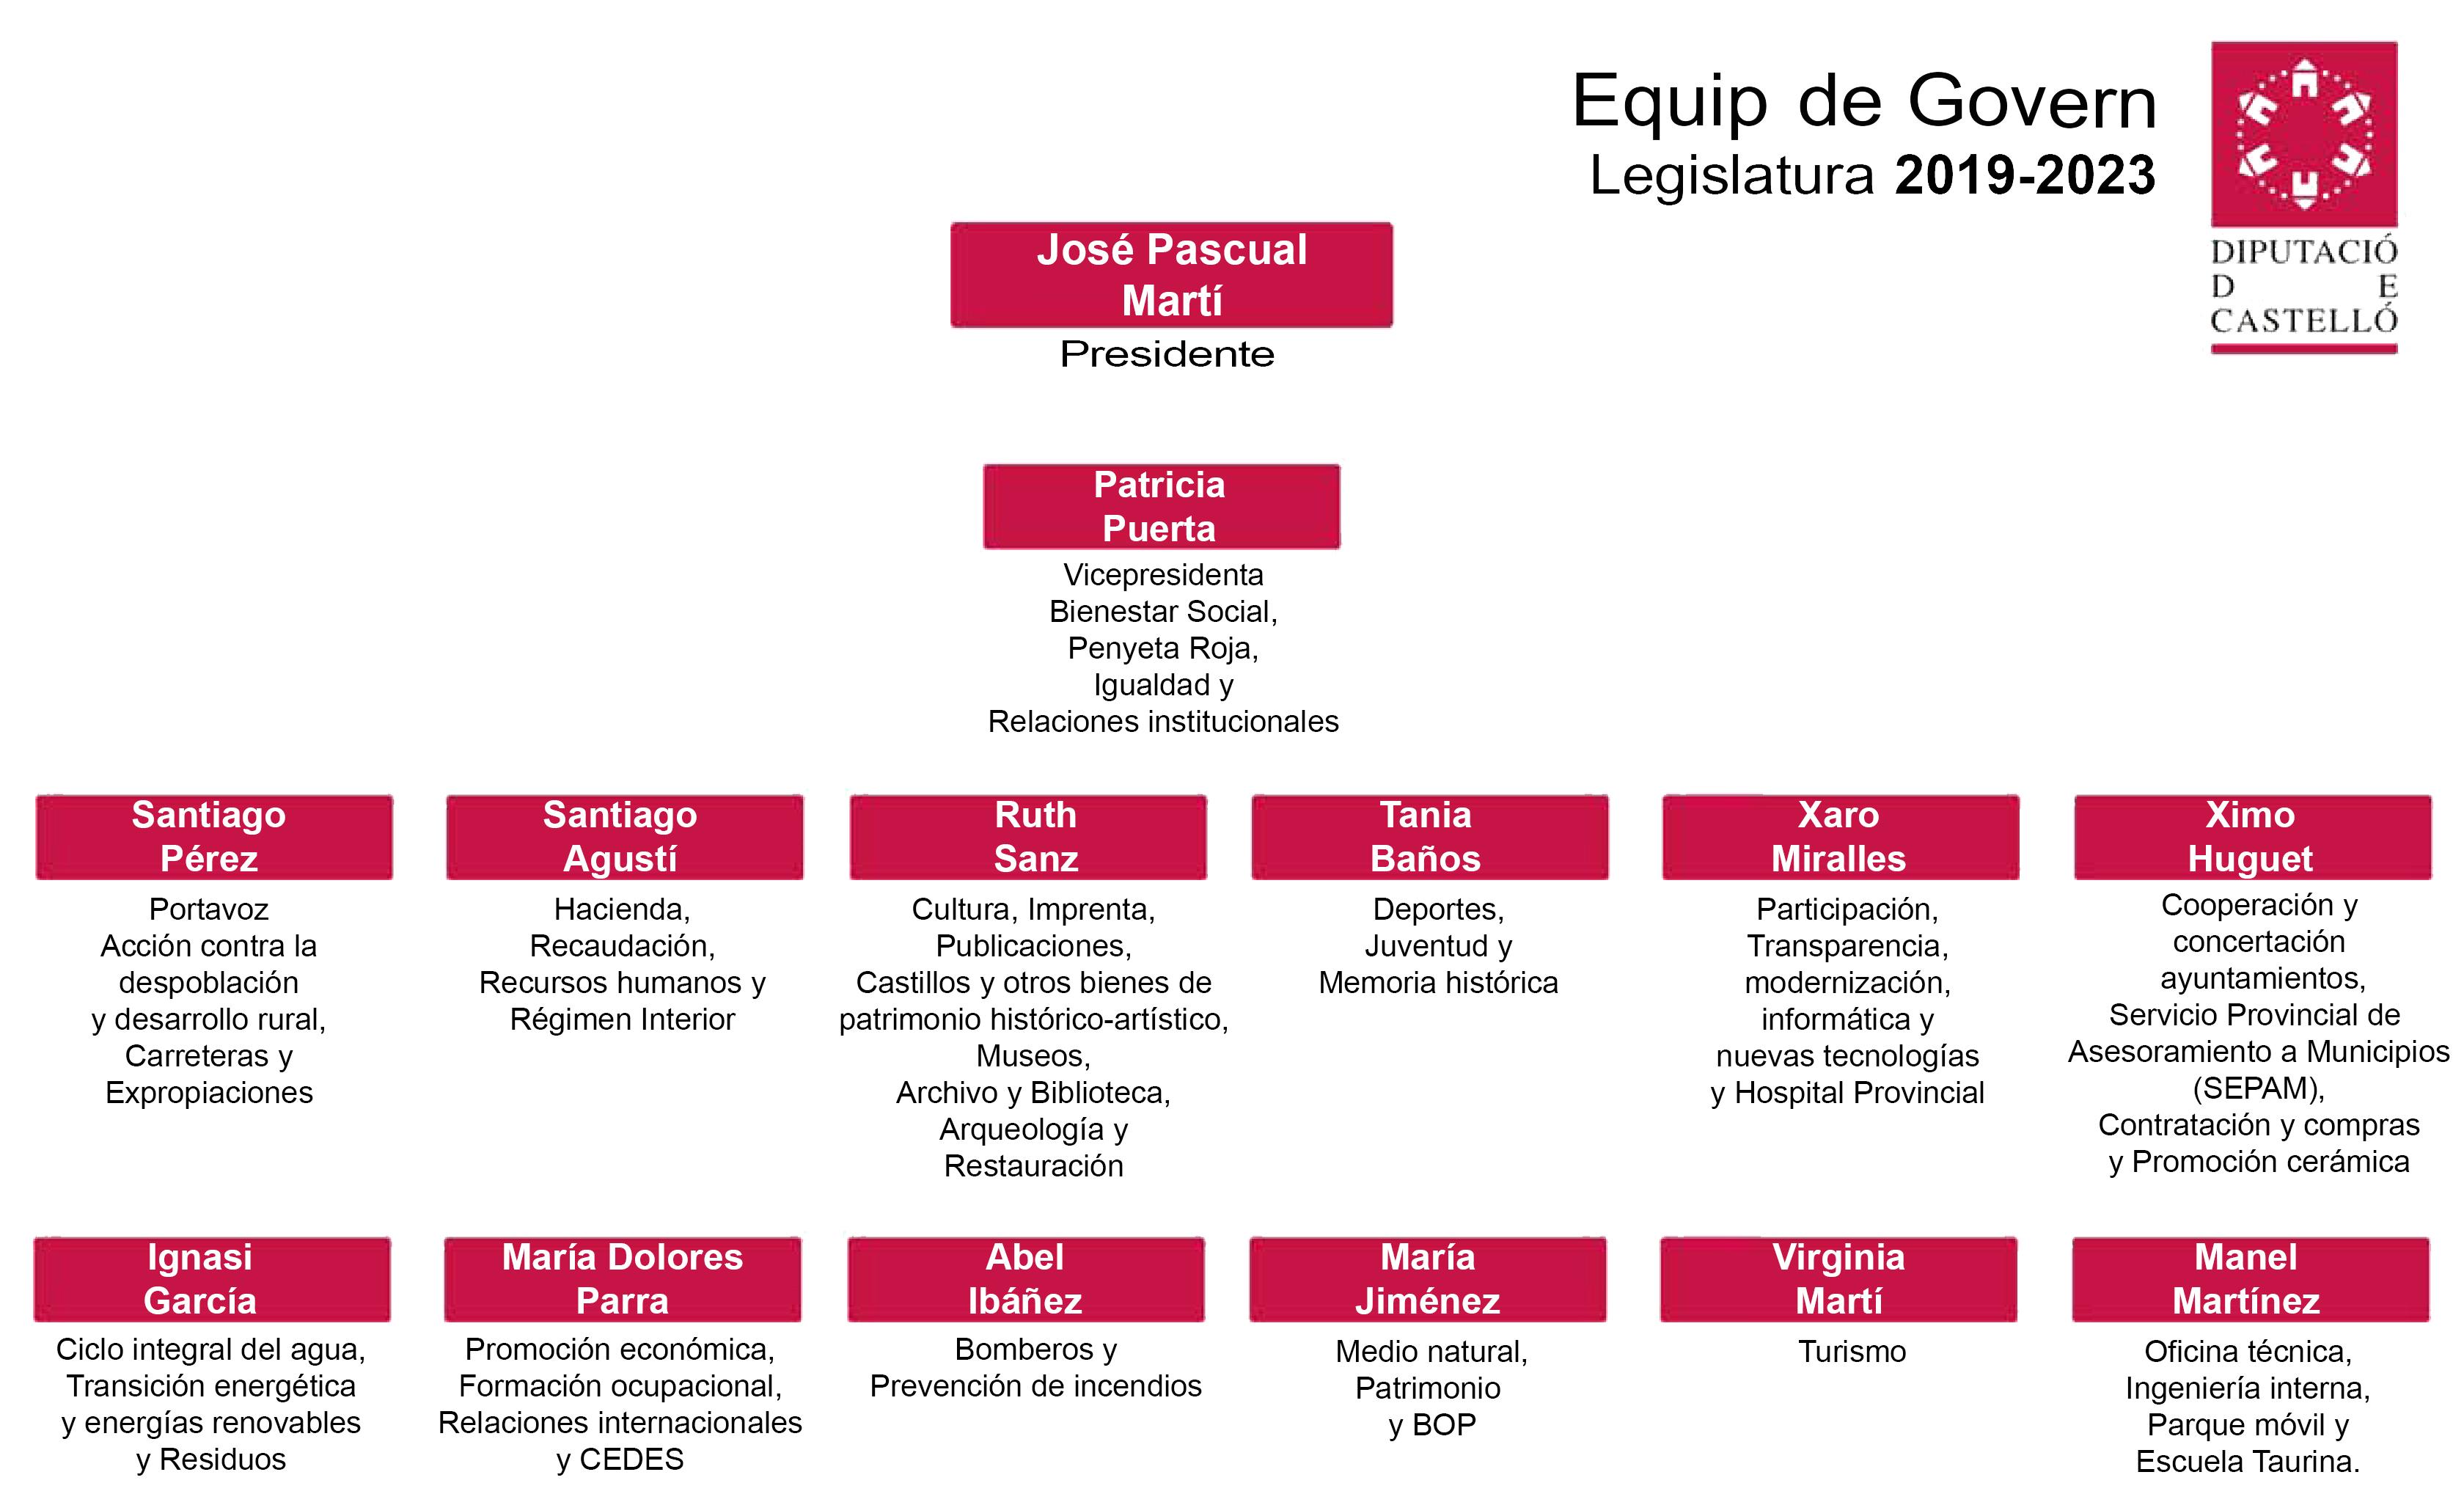 Equip de Govern 2019 - 2023